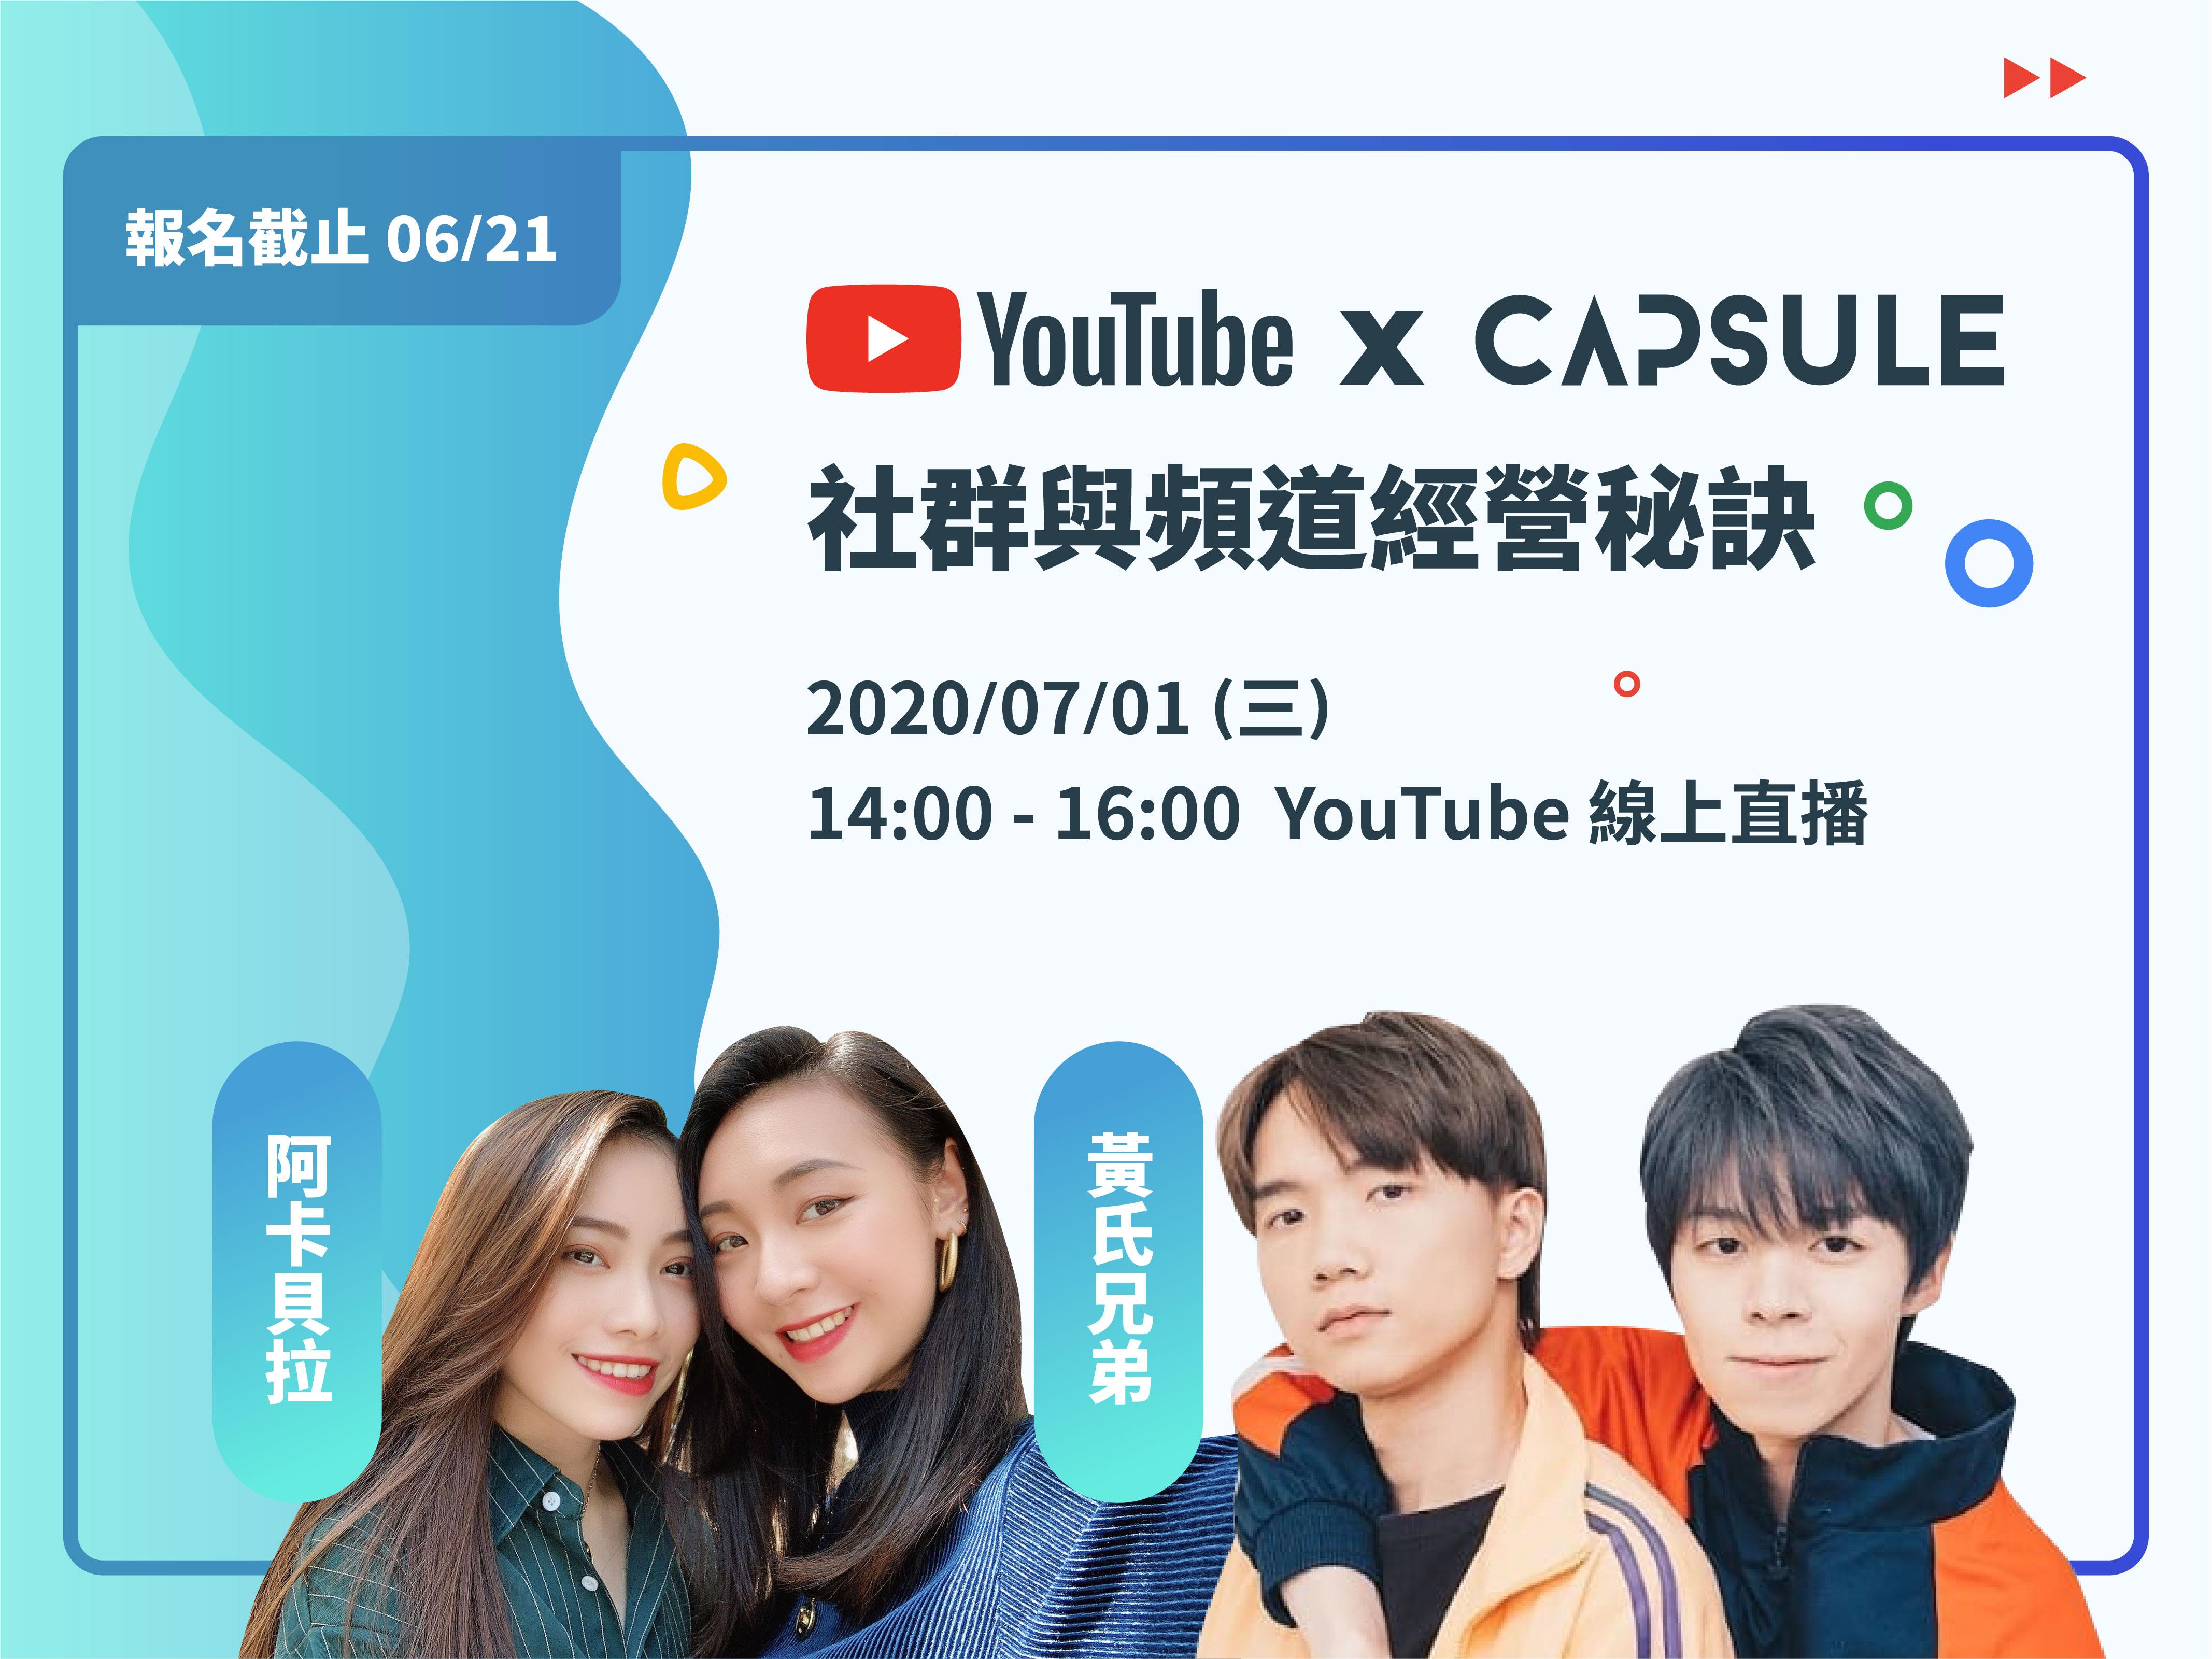 YouTube X CAPSULE 線上直播分享會! 和黃氏兄弟與阿卡貝拉一起《Grow with Google》